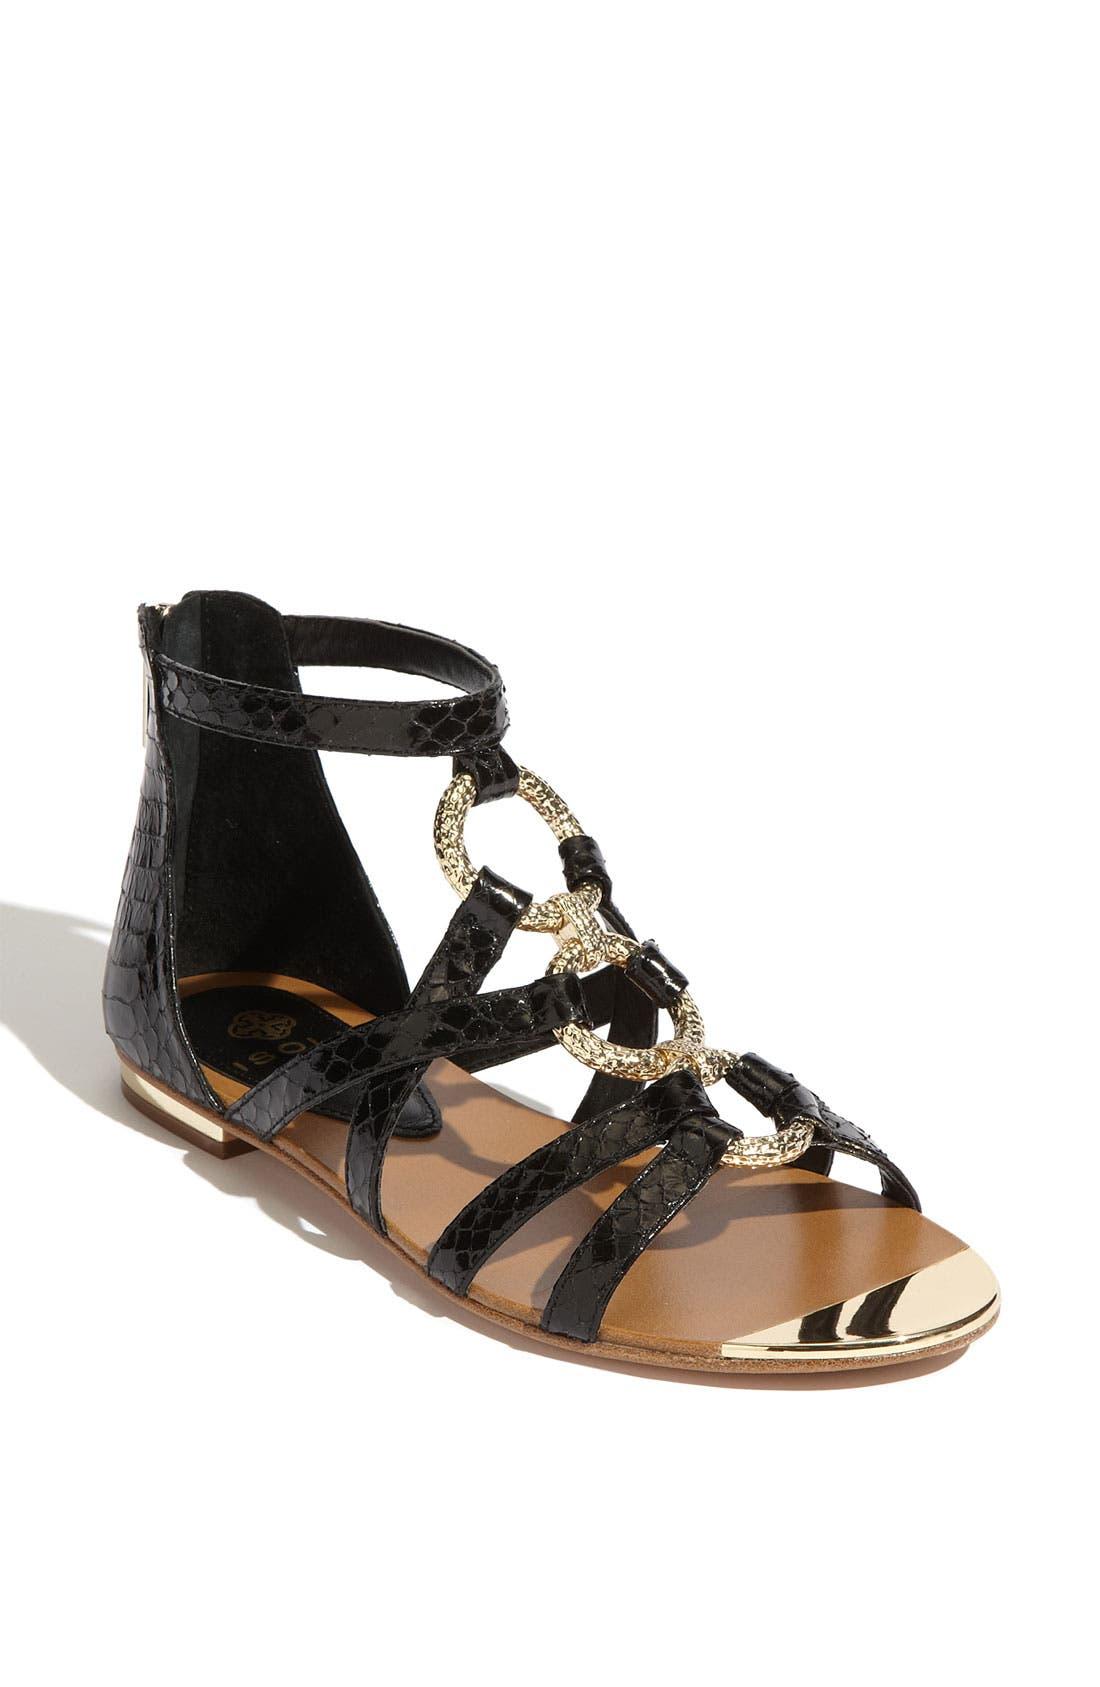 'Adriel' Flat Sandal,                             Main thumbnail 1, color,                             001